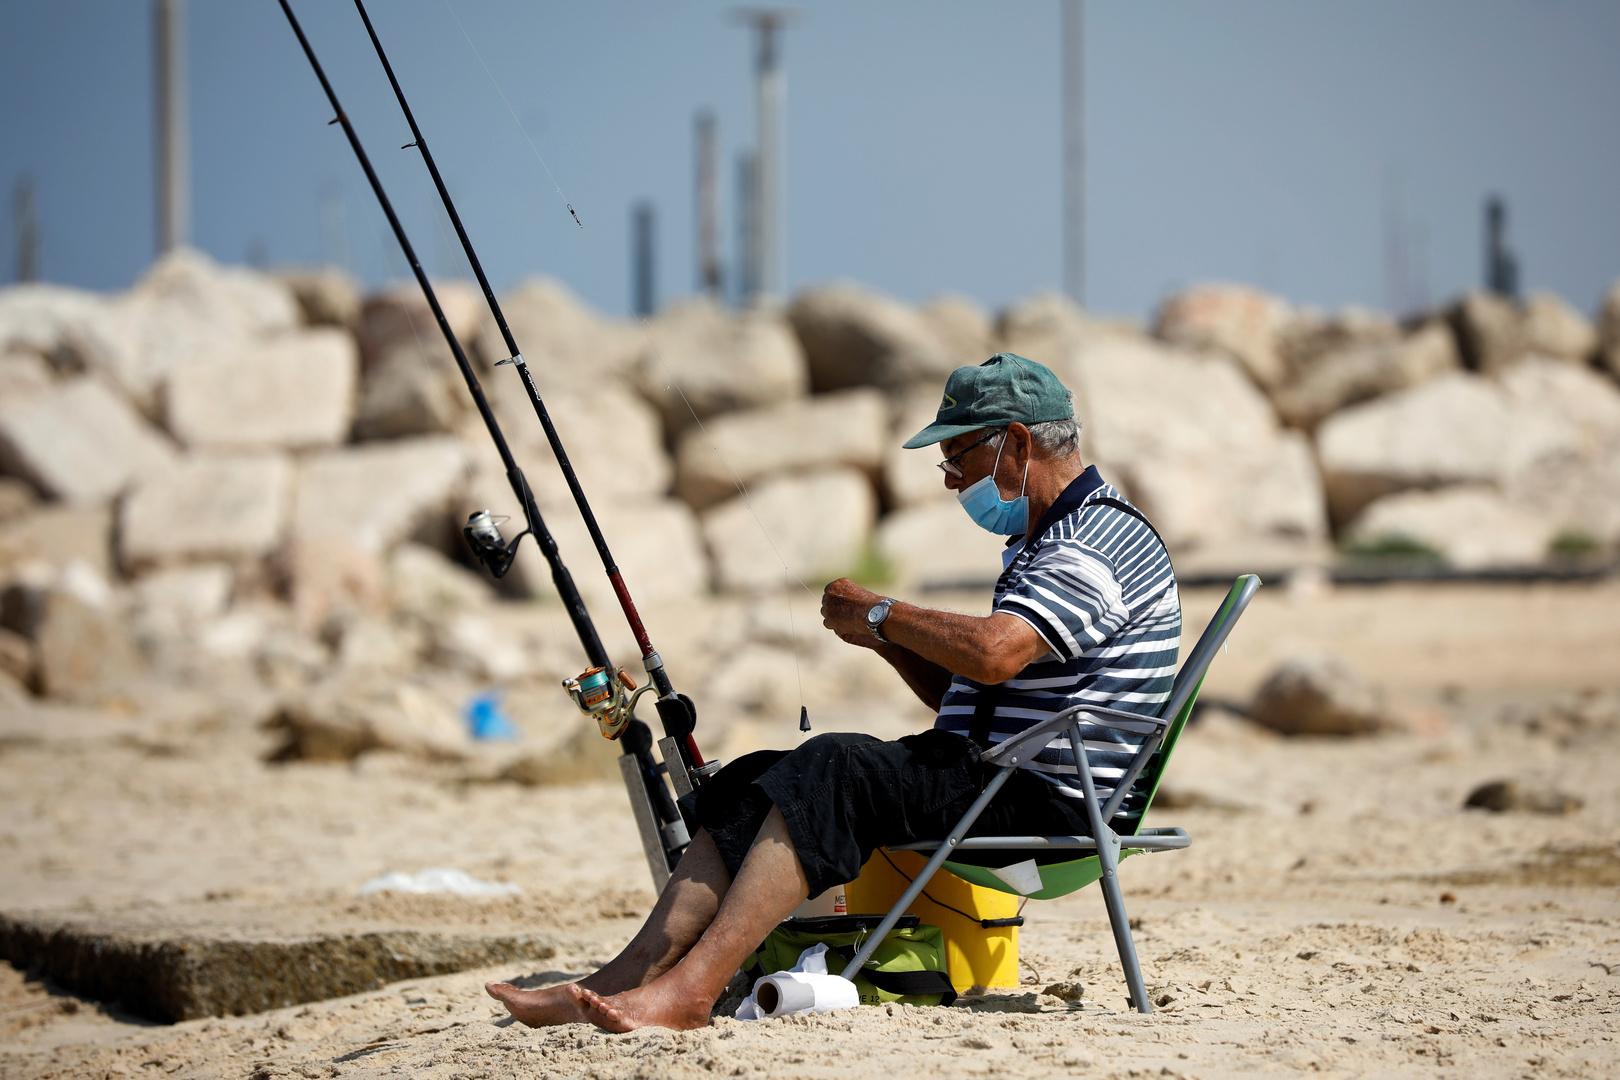 إسرائيل تخفف من قيود كورونا